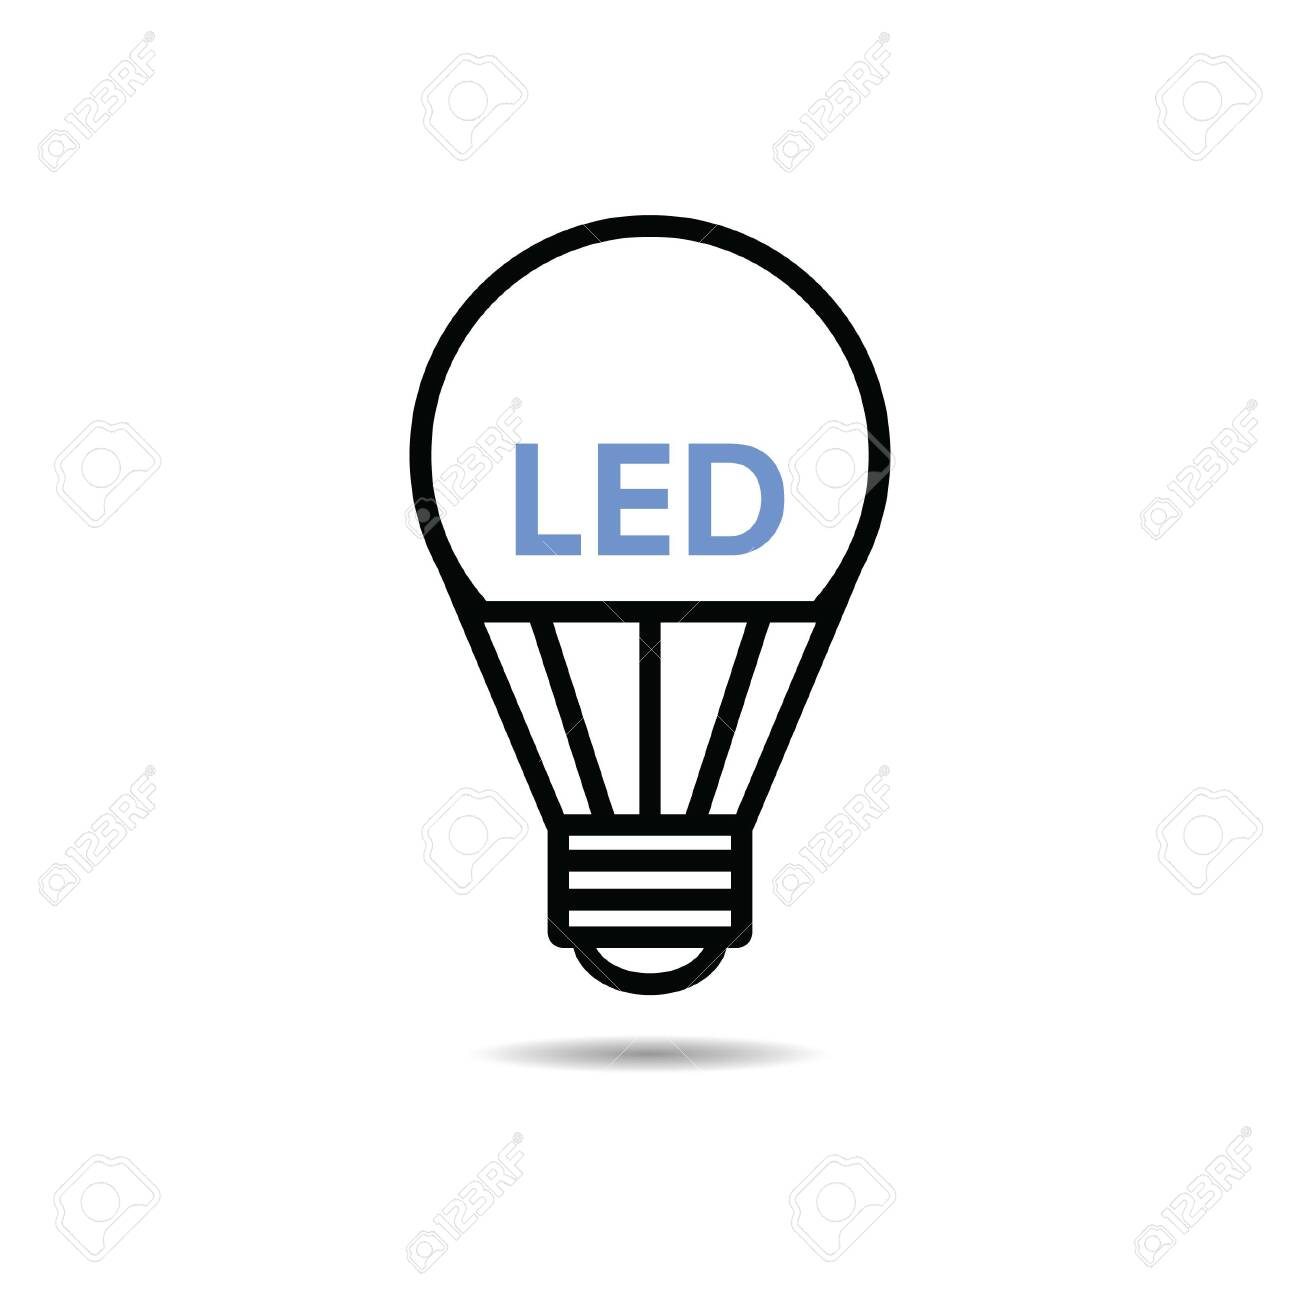 Free Led Vector Icon Illustration Light Royalty Cliparts Bulb byY76gf